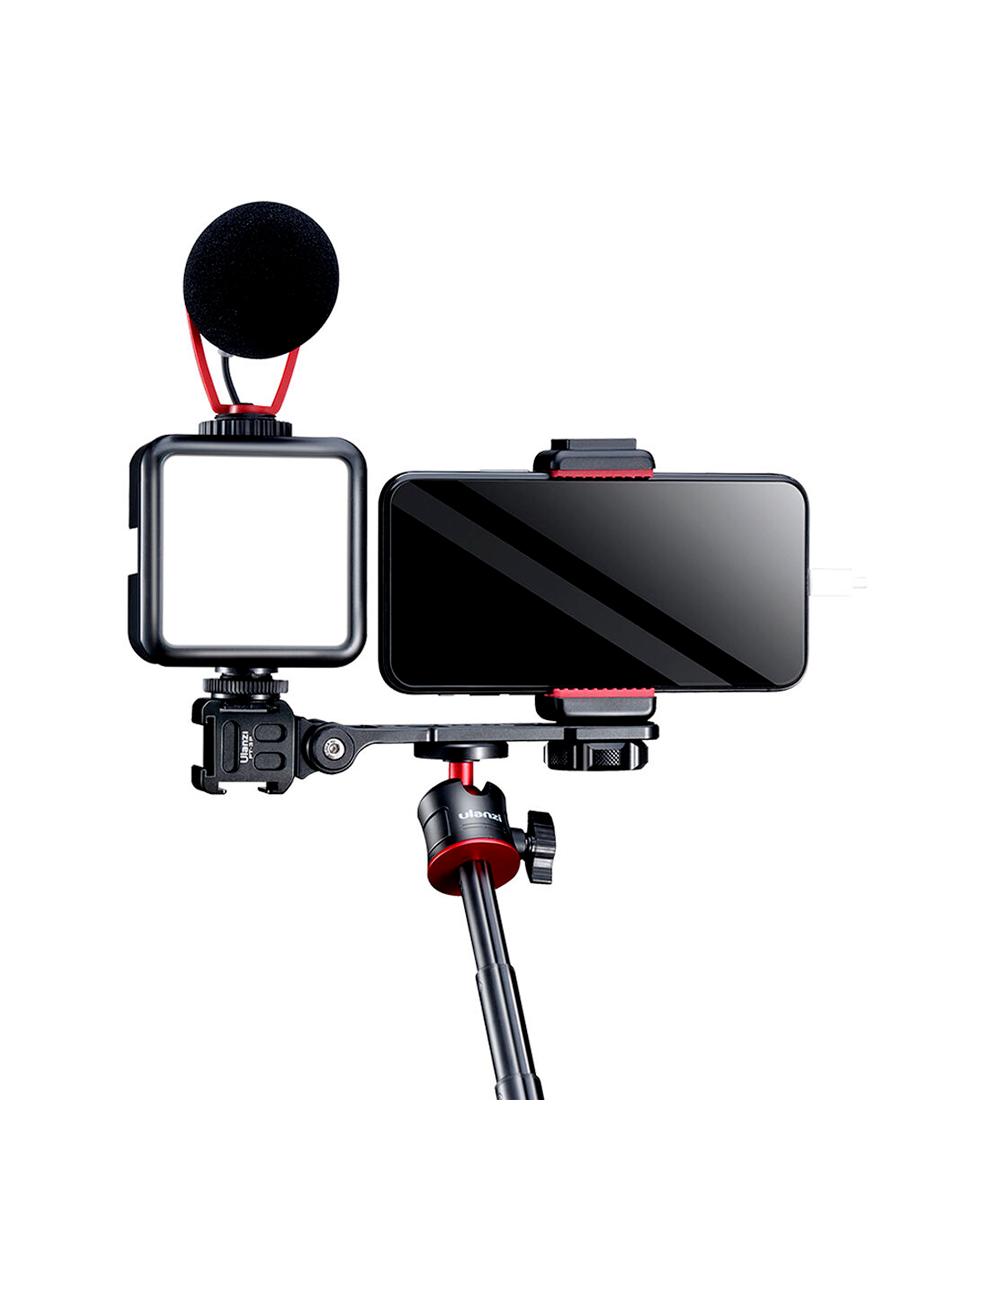 Profoto A1x AirTTL-S Flash Profesional para Cámaras Sony - Nueva version!